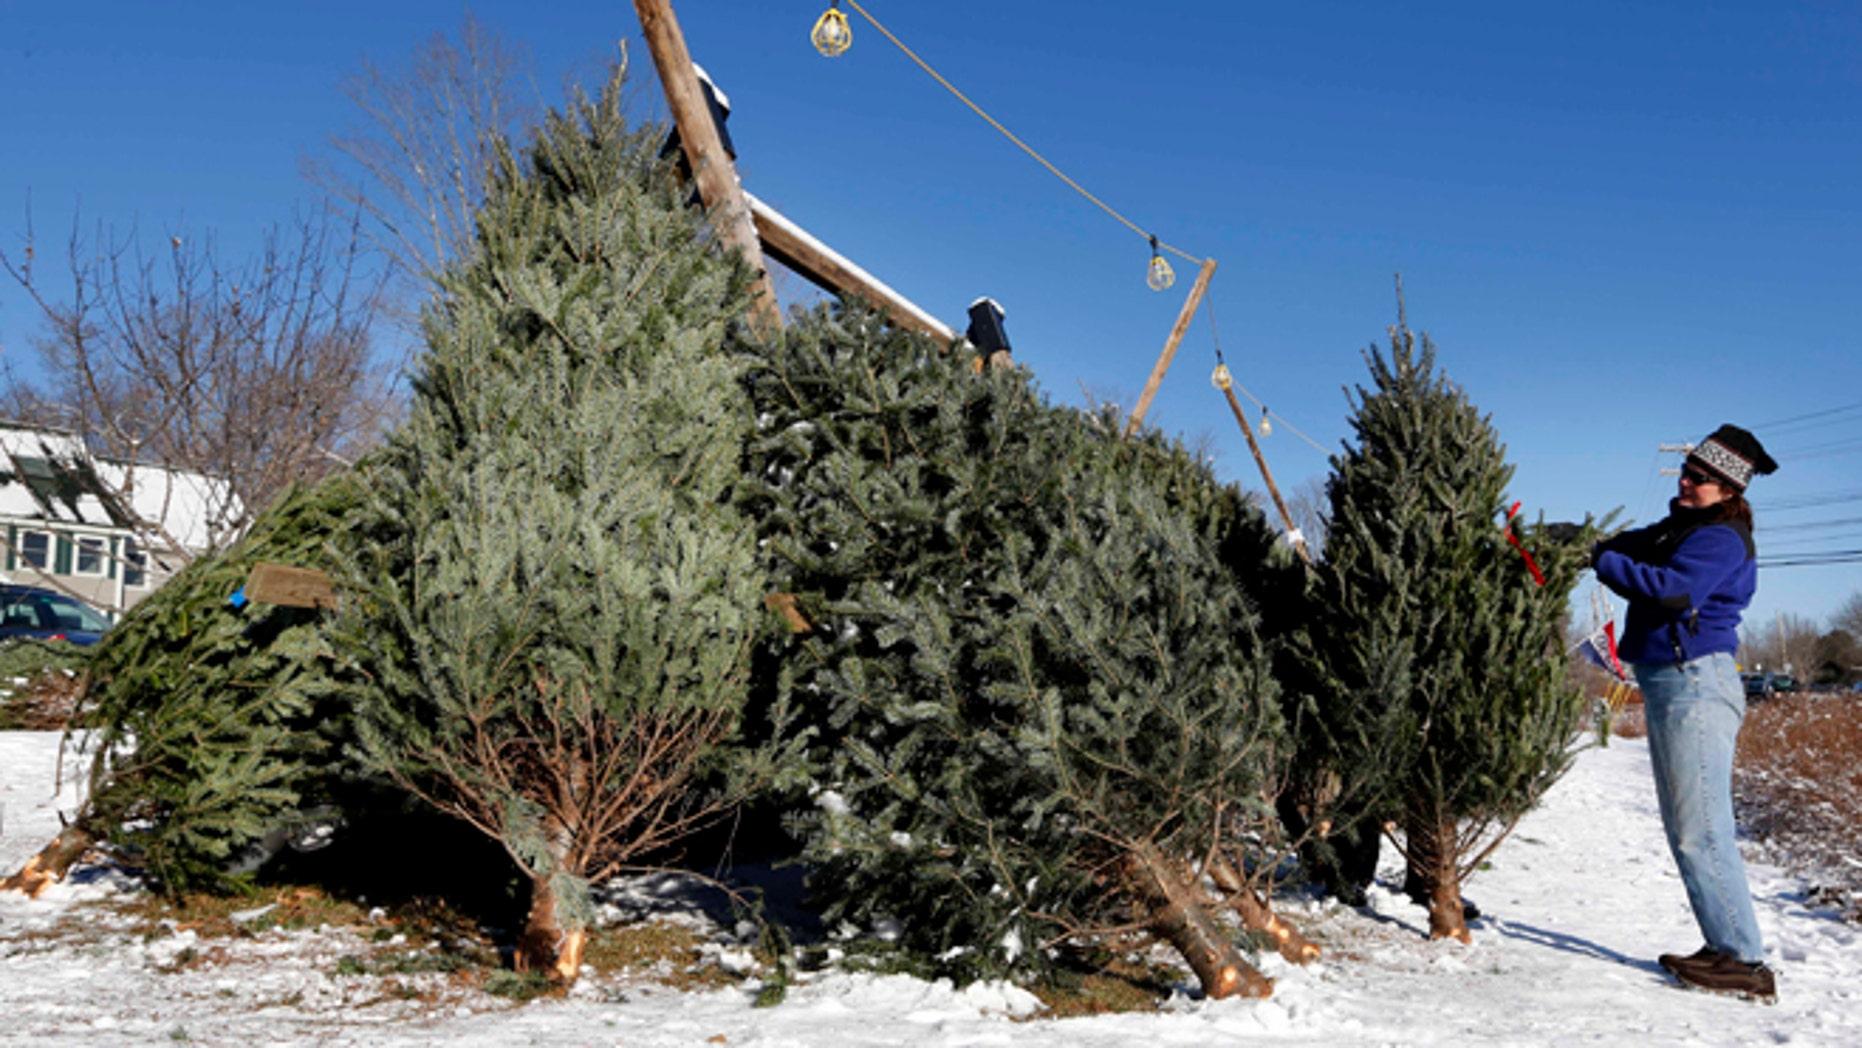 Dec. 12, 2013: A customer picks a Christmas tree in Freeport, Maine.